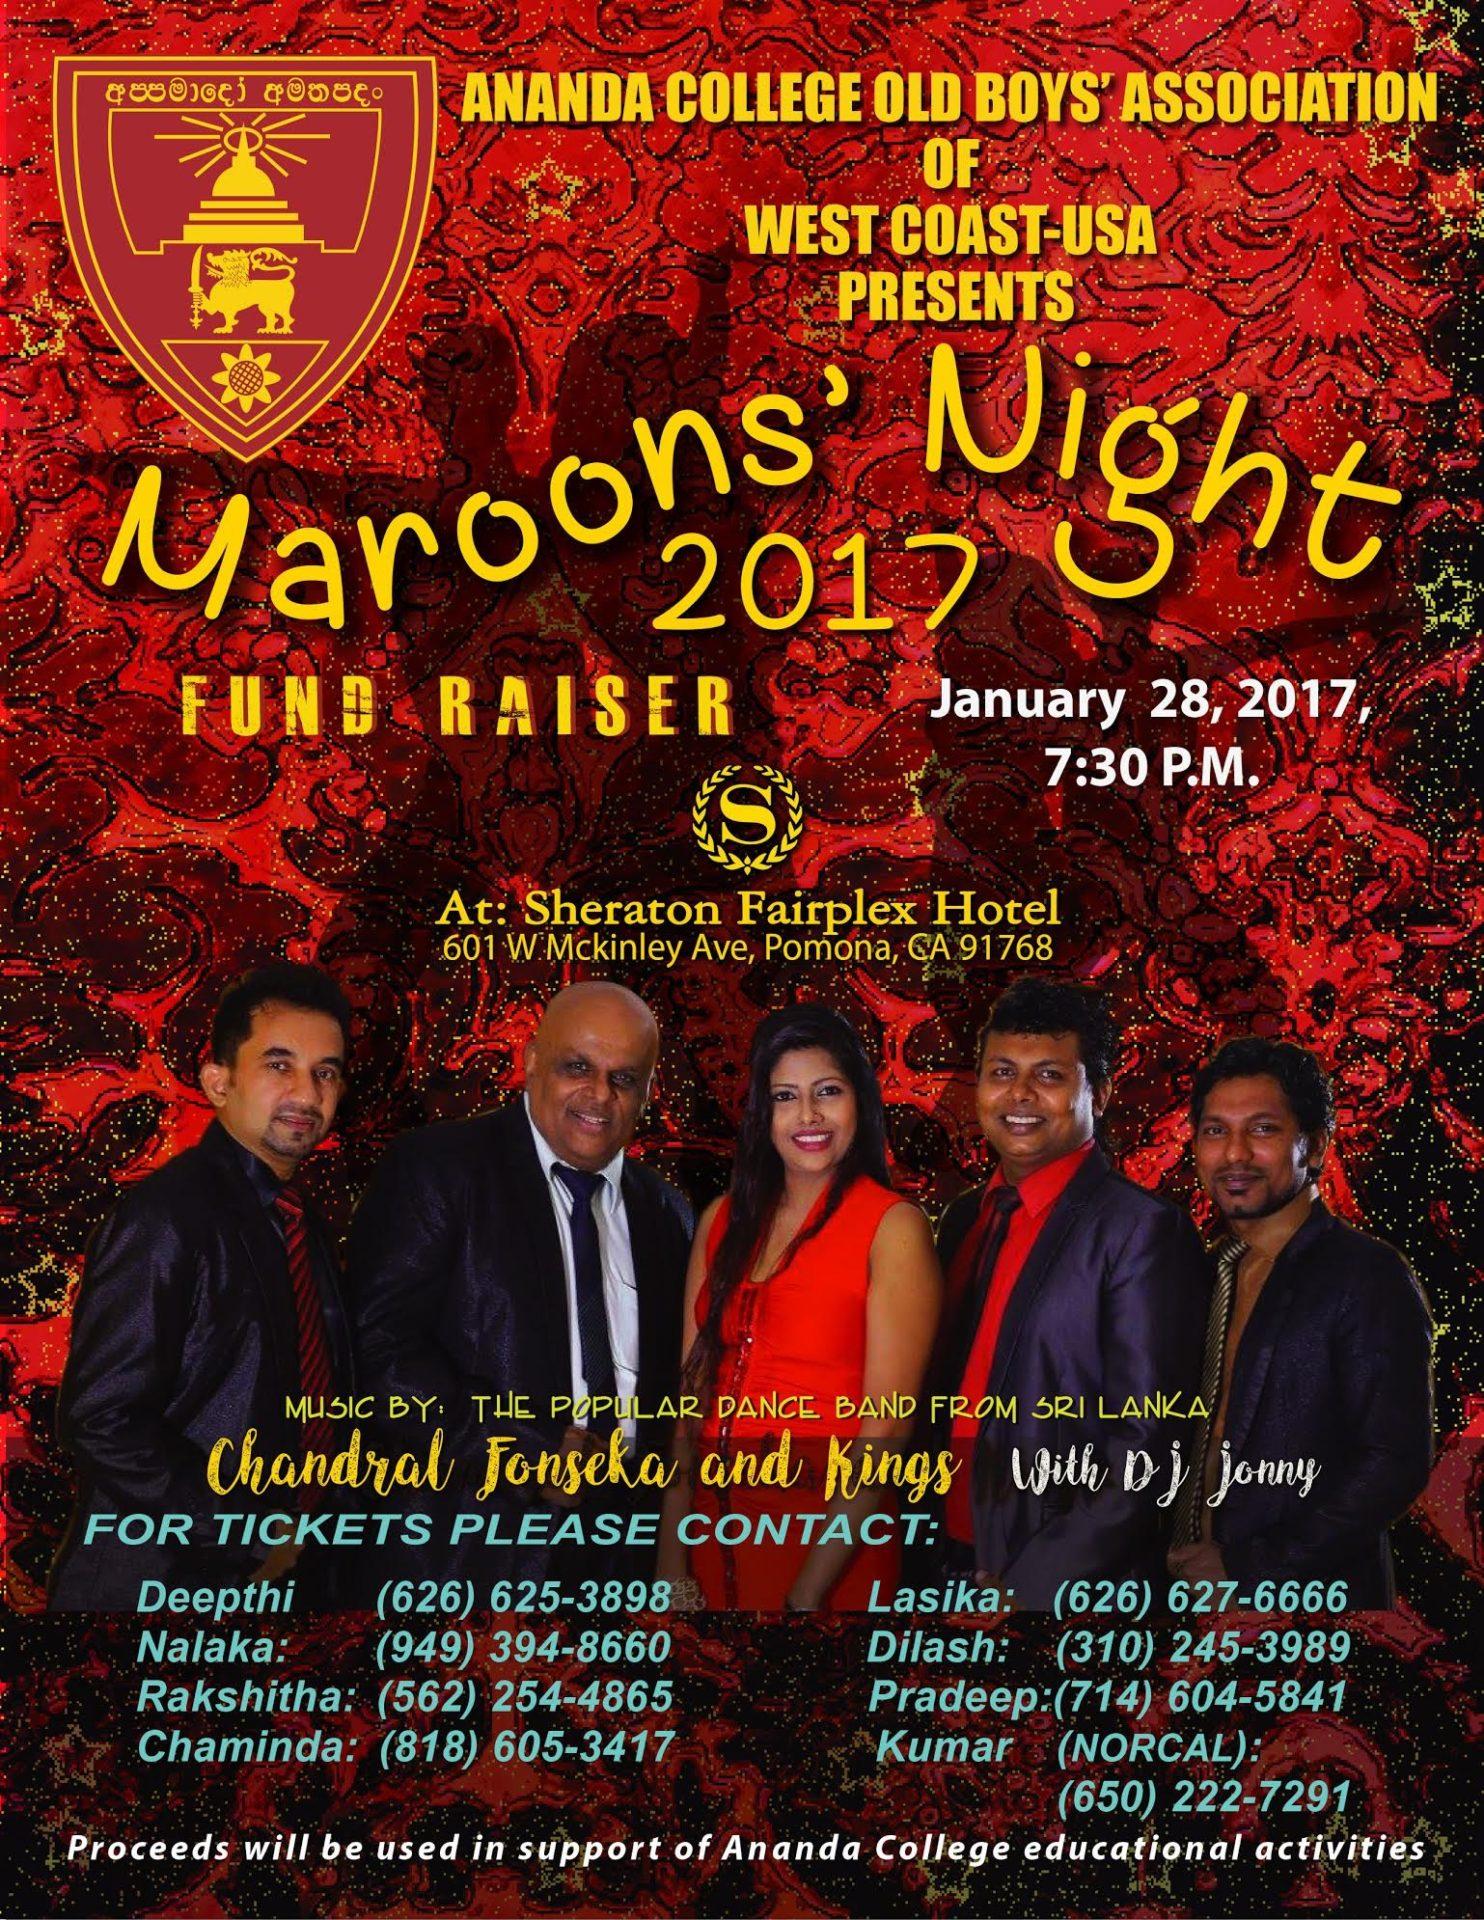 Maroons' Night 2017